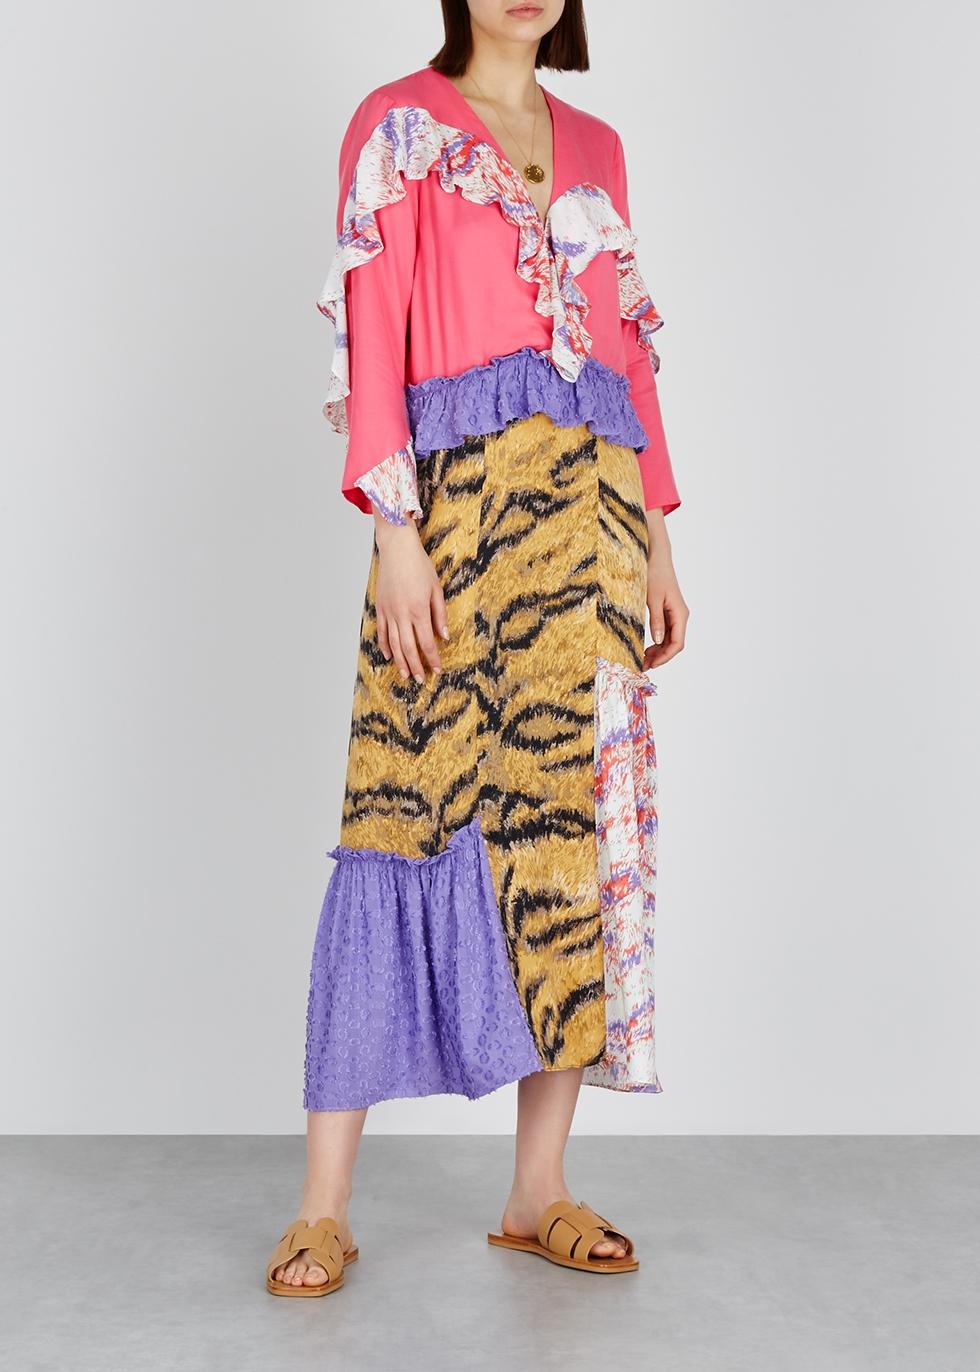 Elinore printed ruffle-trimmed midi dress - Hofmann